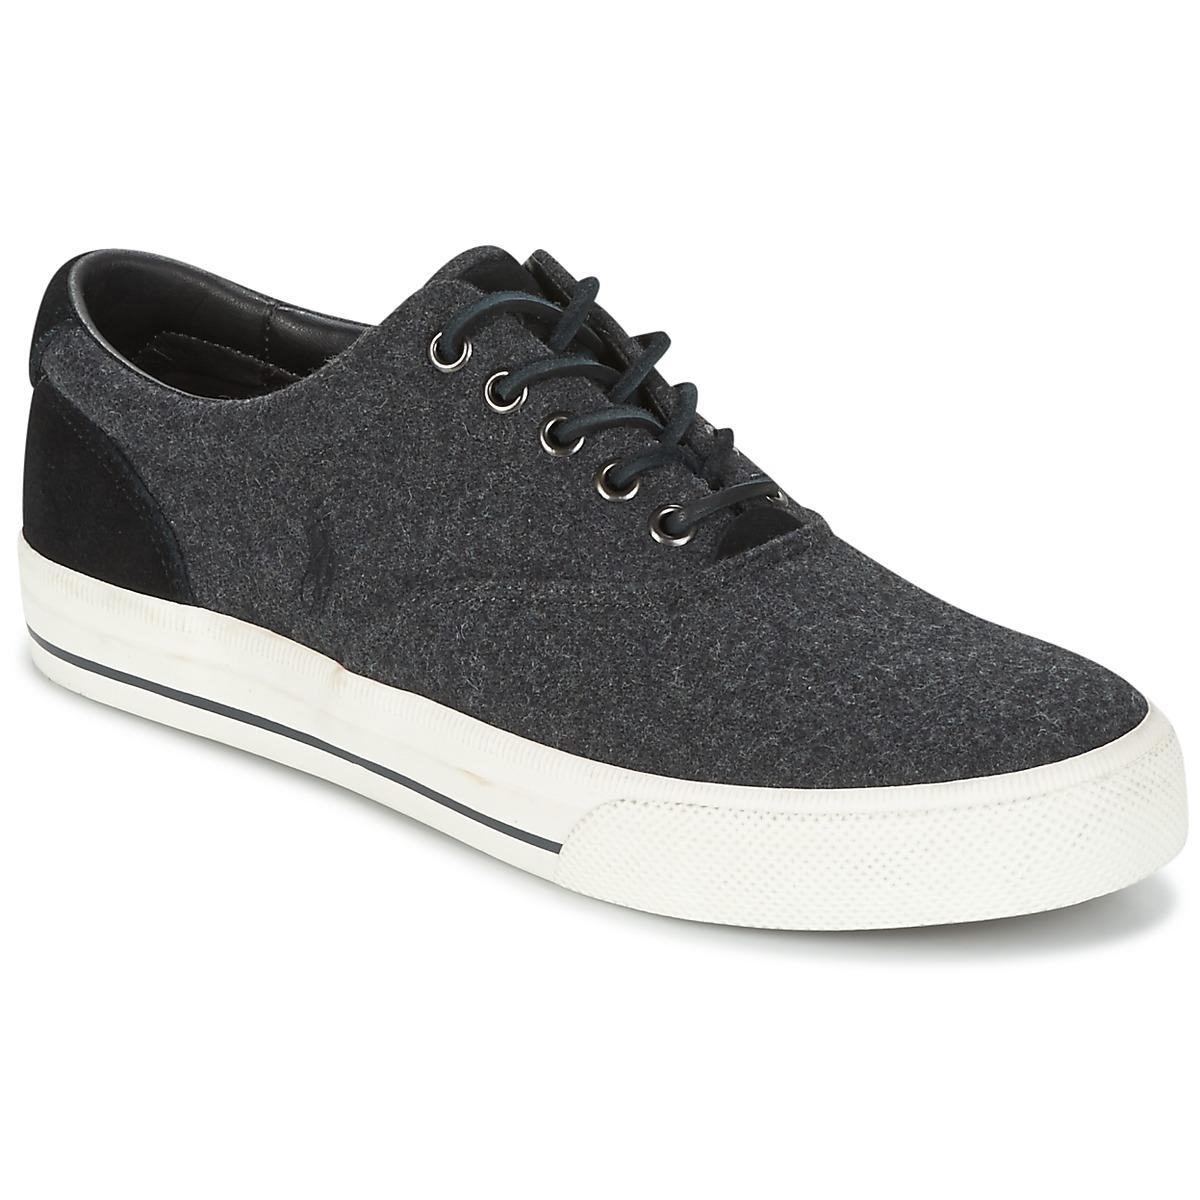 Polo Ralph Lauren VAUGHN Grau - Kostenloser Versand bei Spartoode ! - Schuhe Sneaker Low Herren 79,19 €